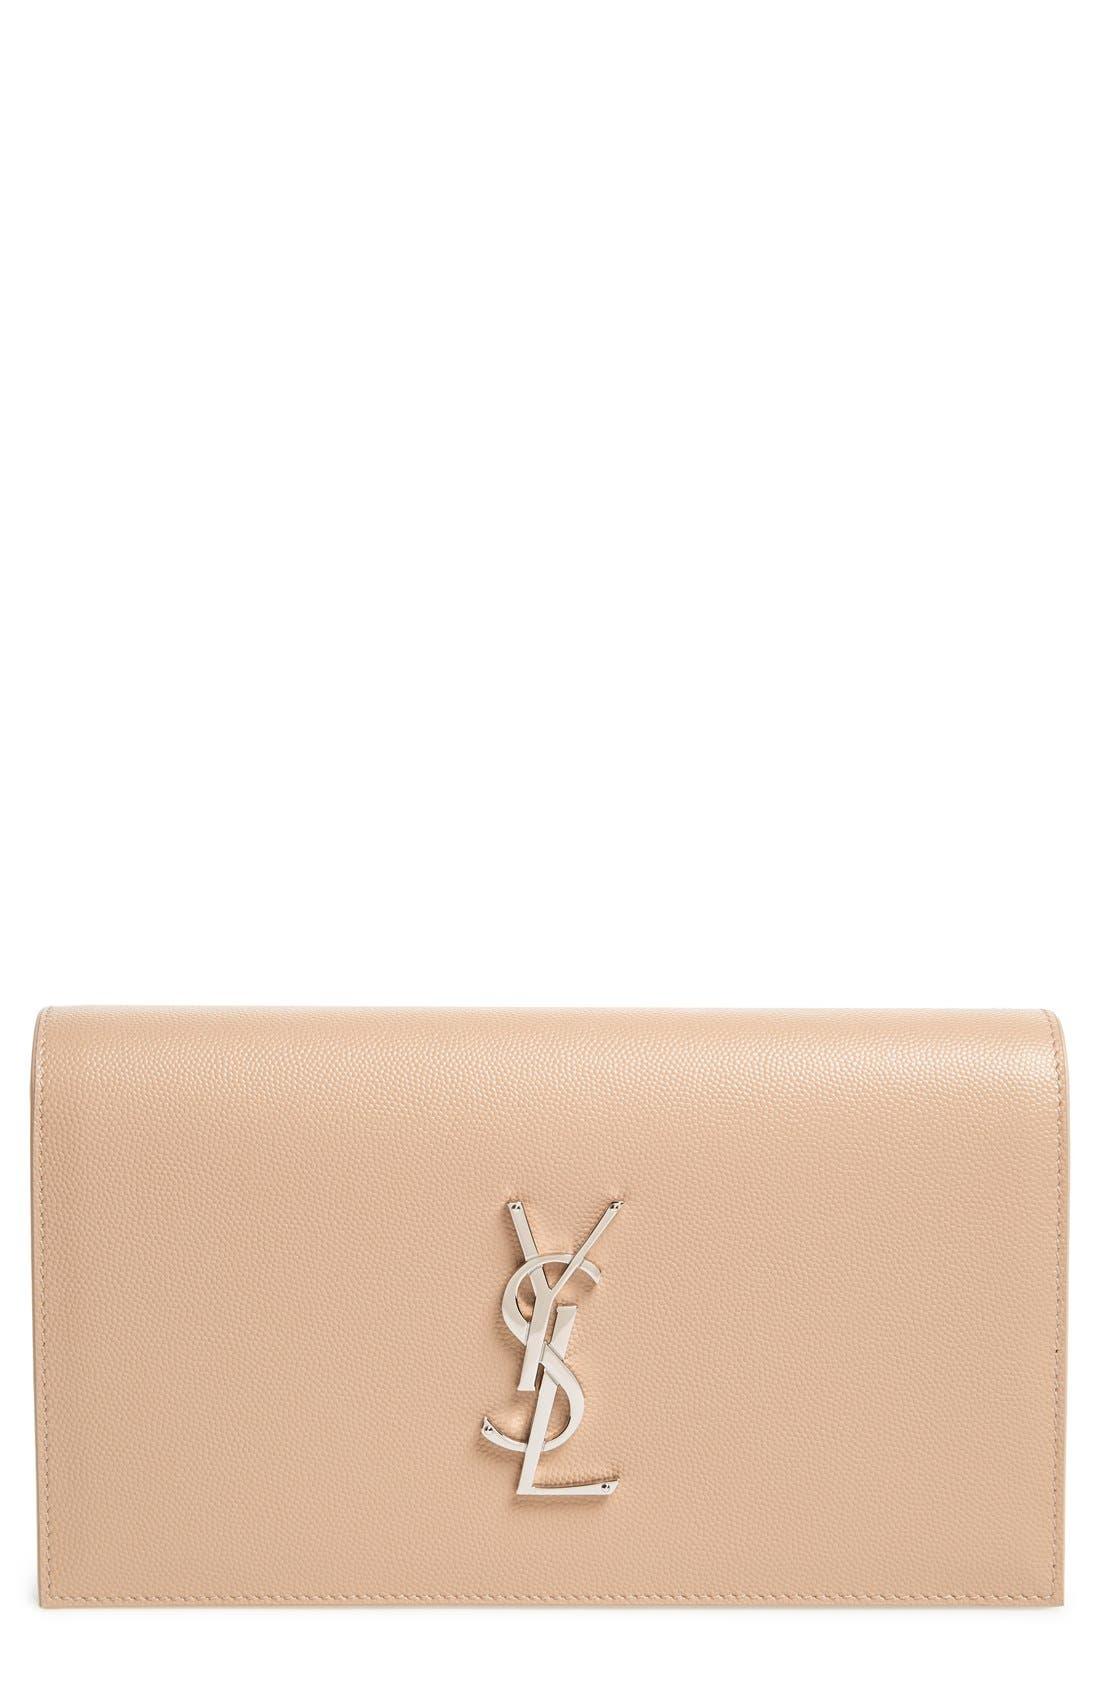 'Monogram' Leather Clutch,                         Main,                         color, 250